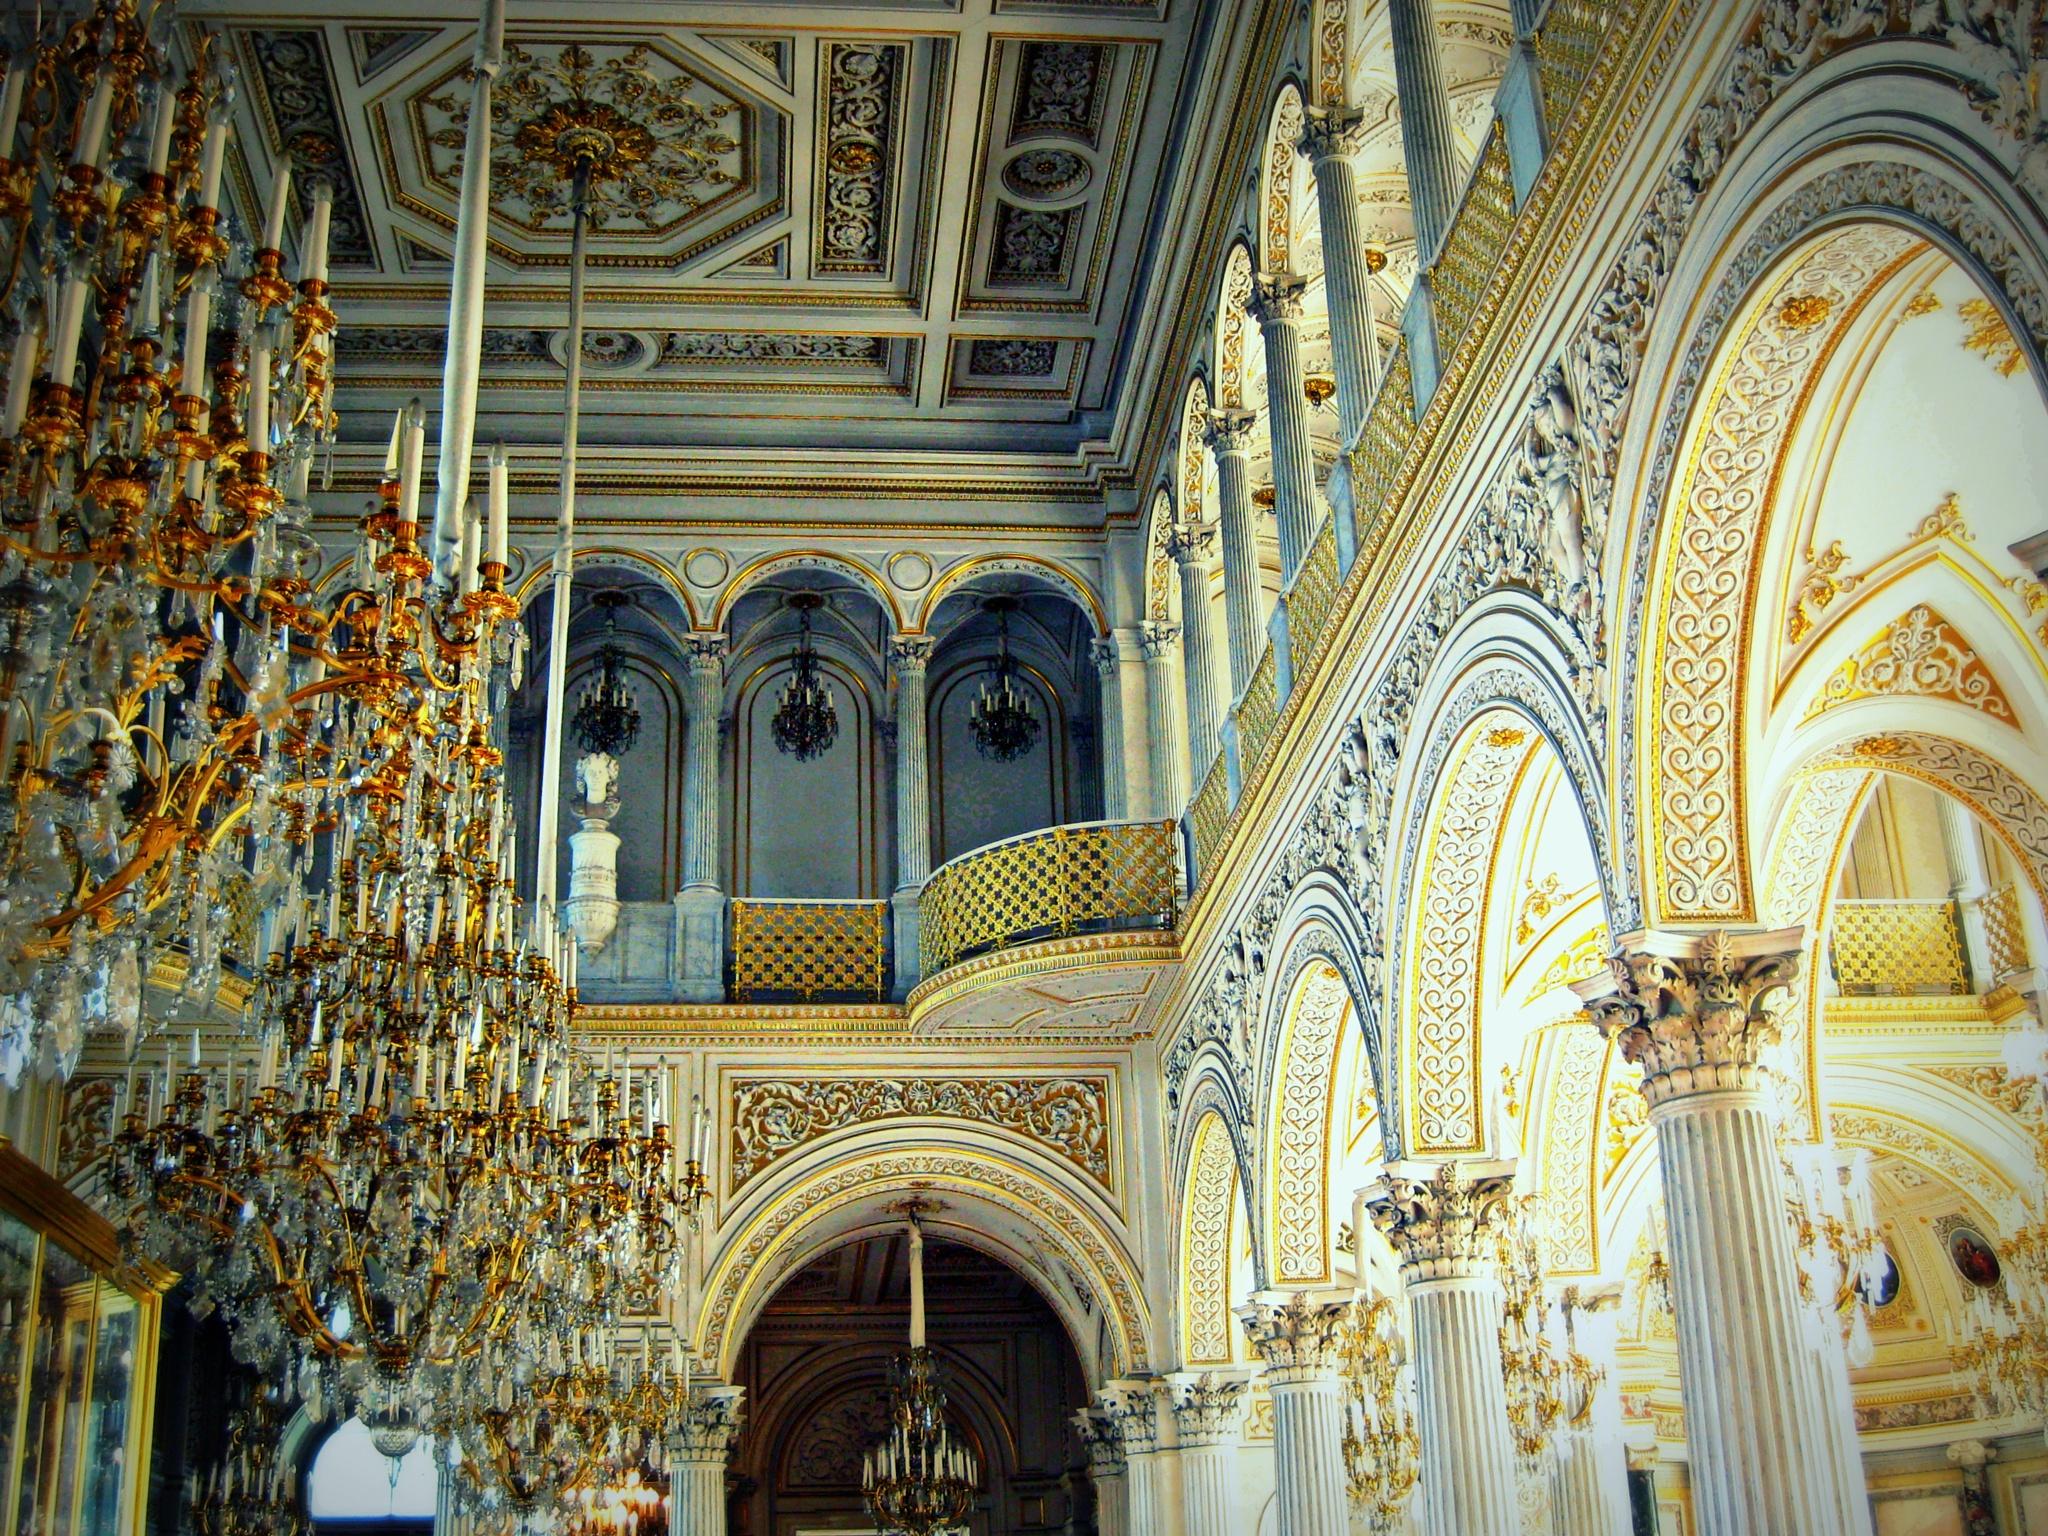 san petersburgo rusia by angelgarcia